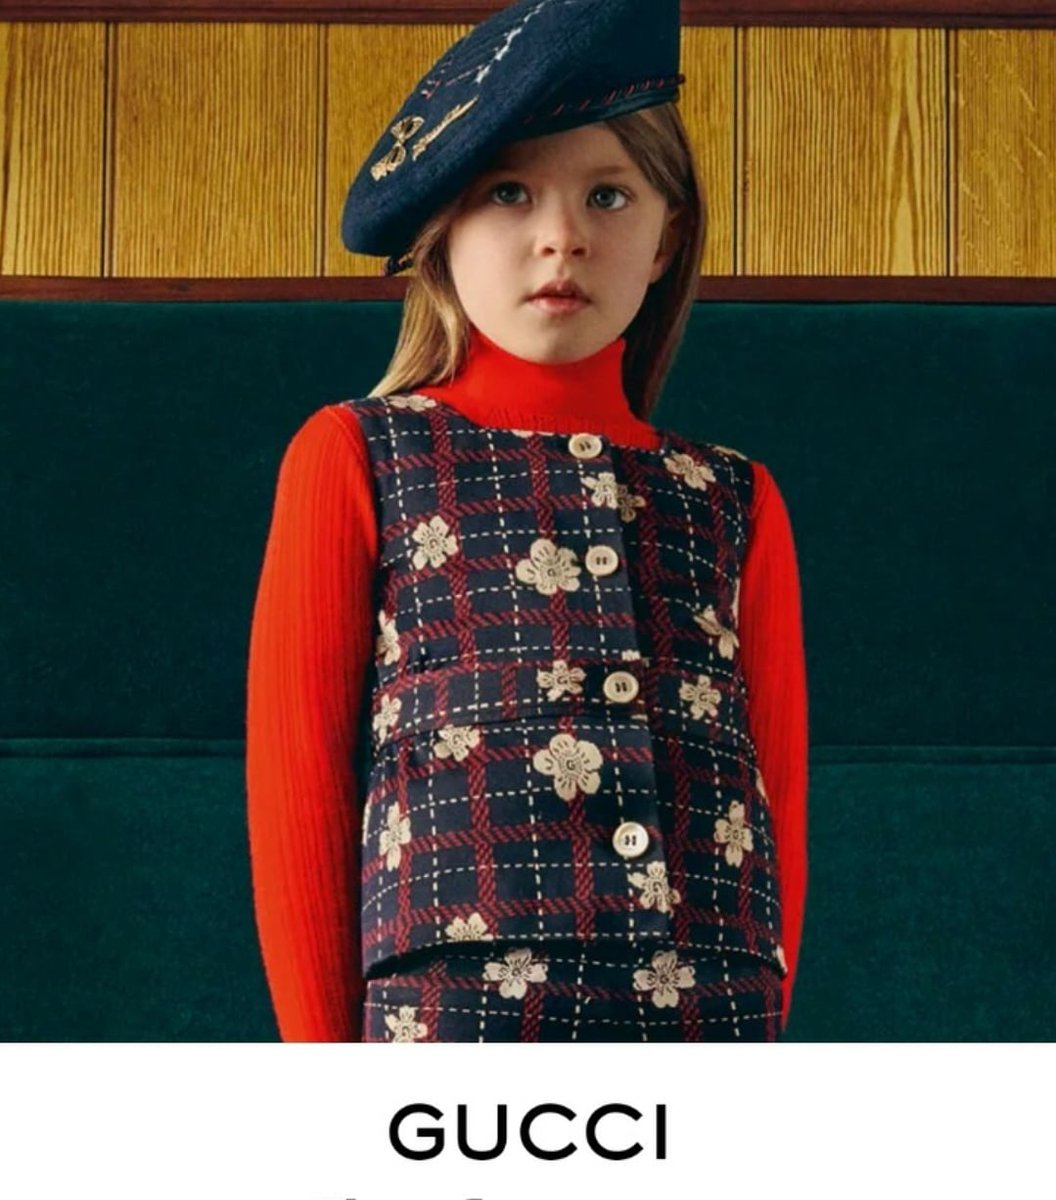 Another gorgeous Gucci spot of Freya #teamlacara #proudagent #childmodel #guccipic.twitter.com/CYZQXzkCQf